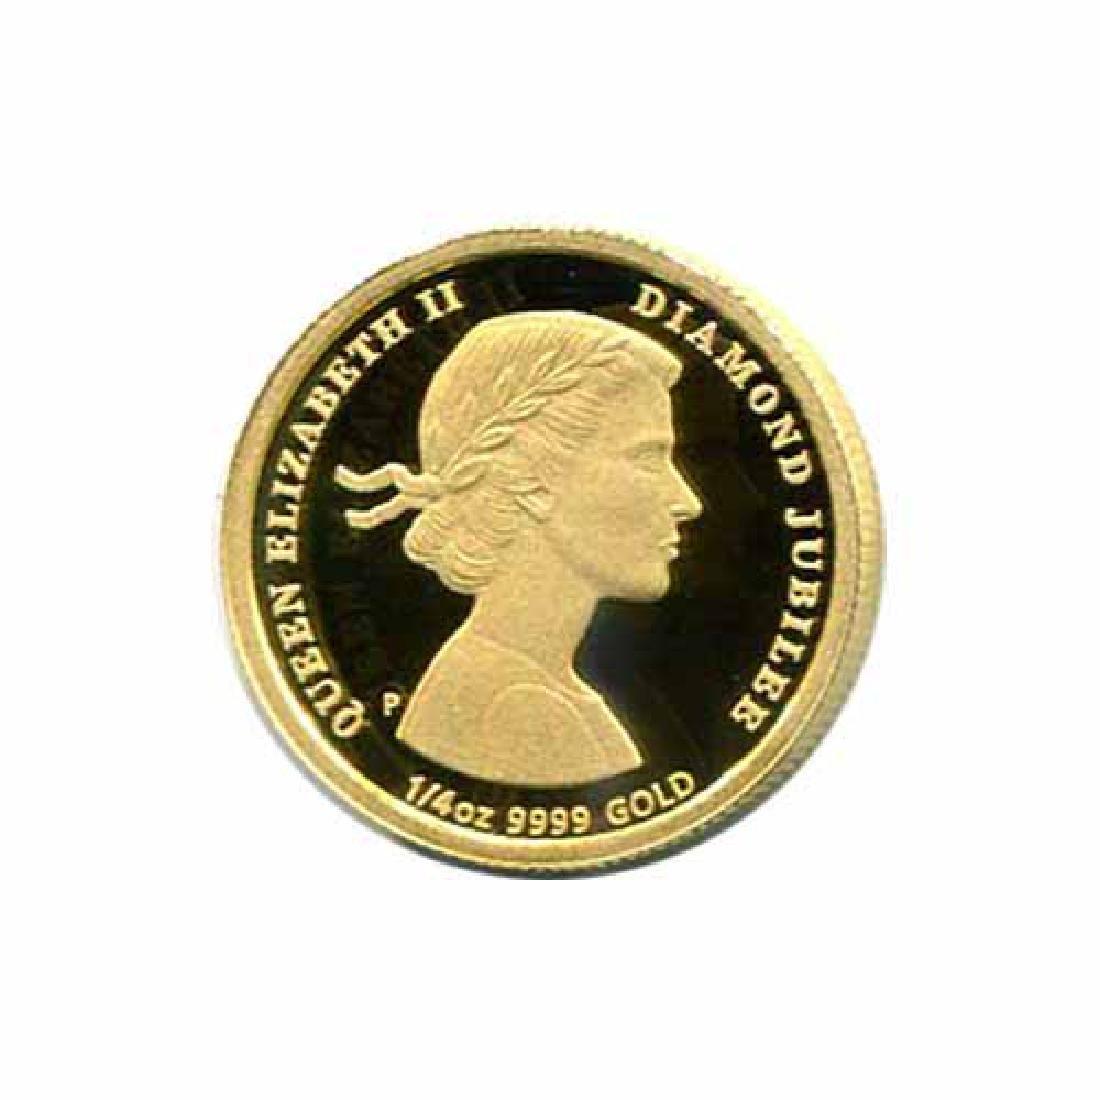 Australia $25 Gold PF 2012 Diamond Jubilee